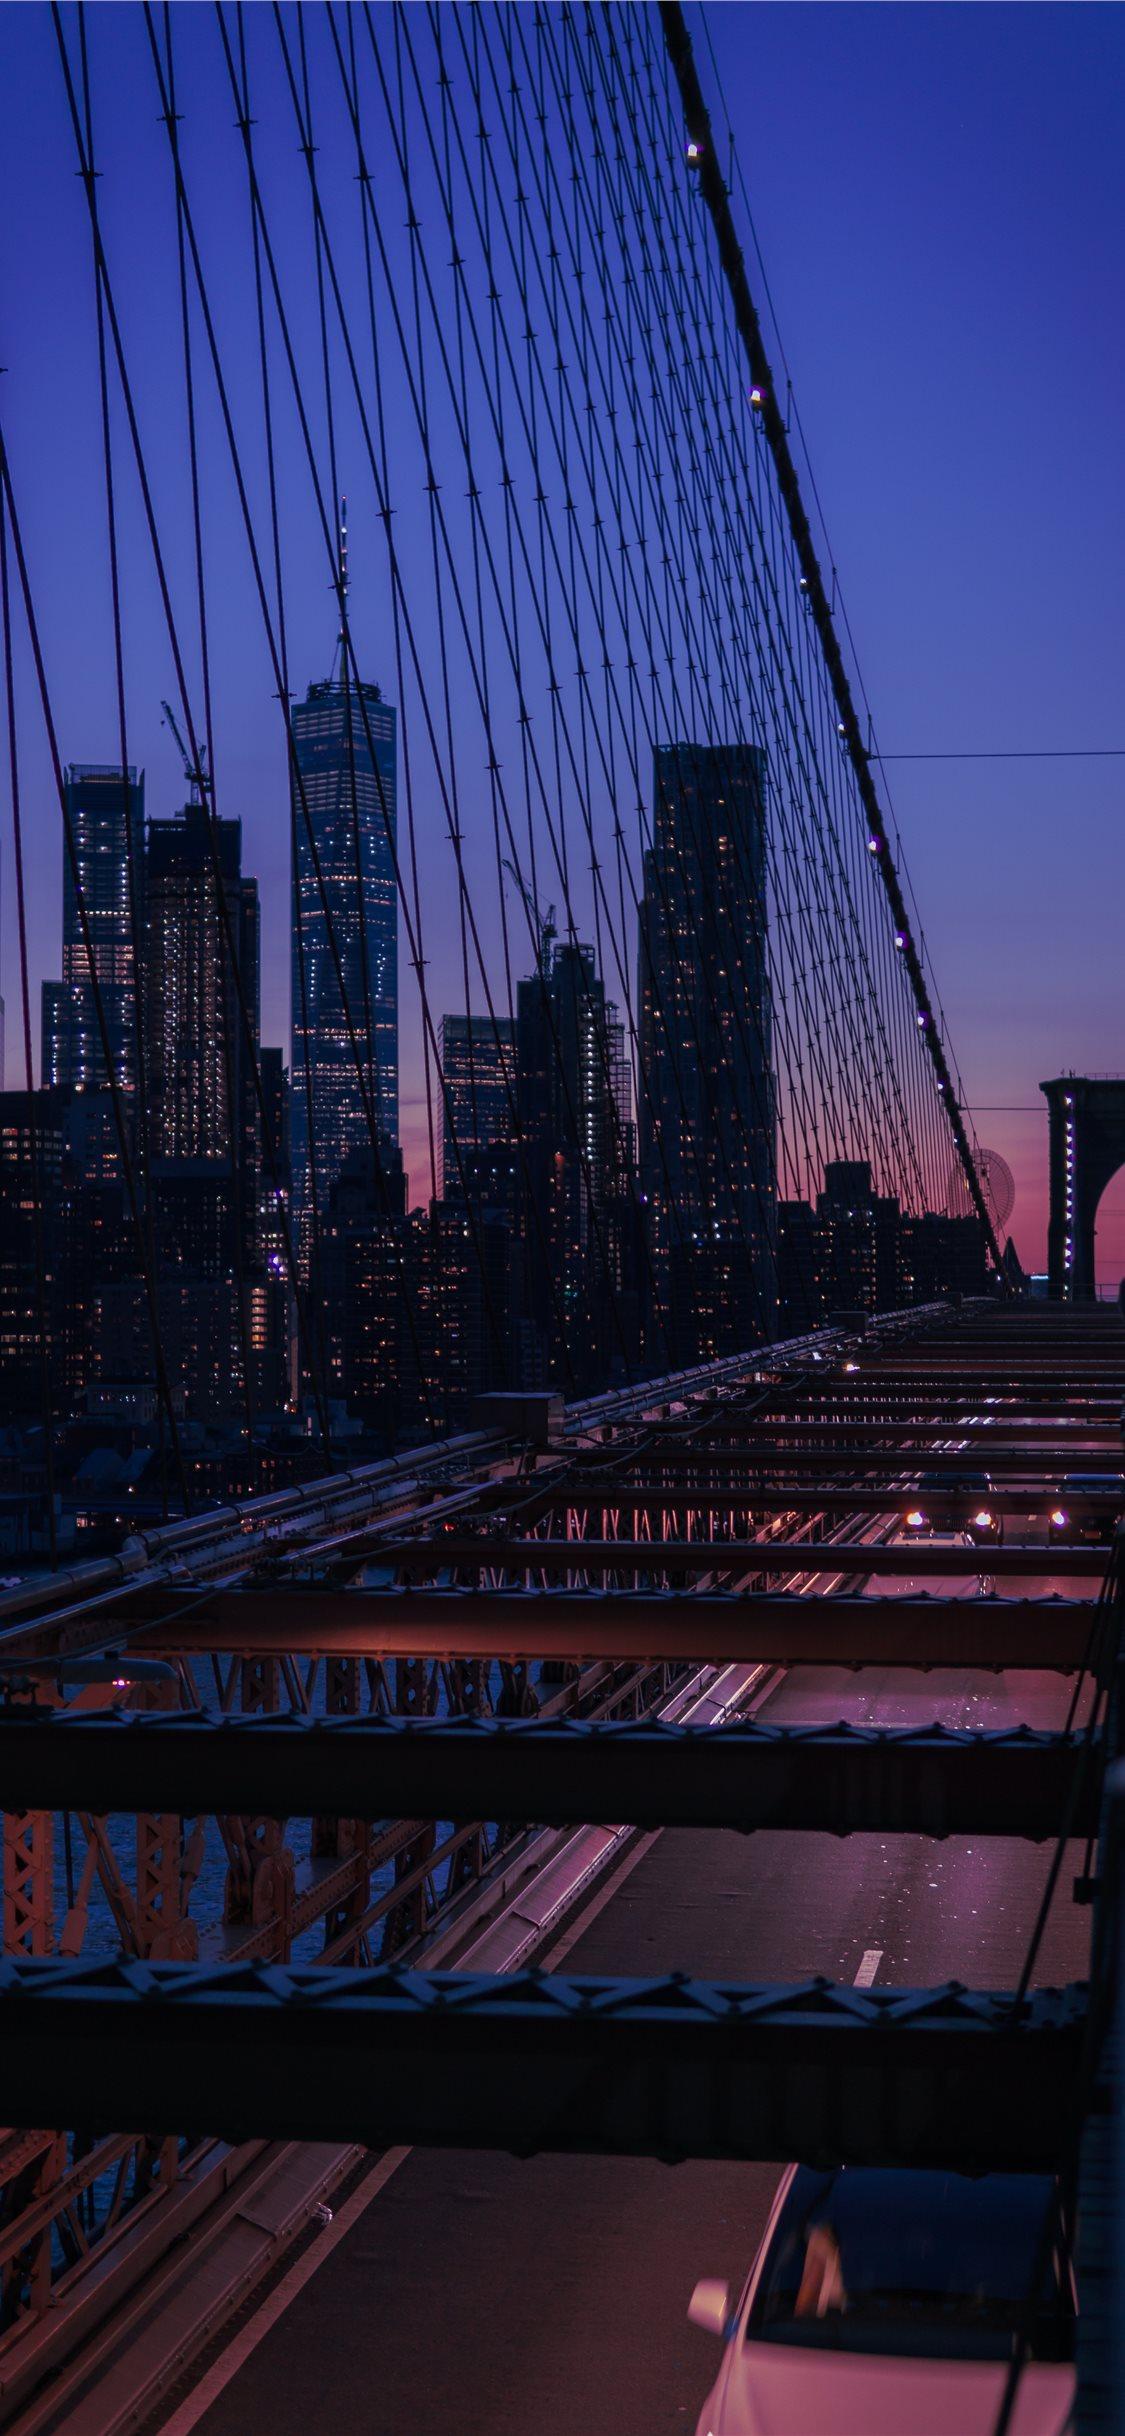 Best New York Iphone X Wallpapers Hd Ilikewallpaper